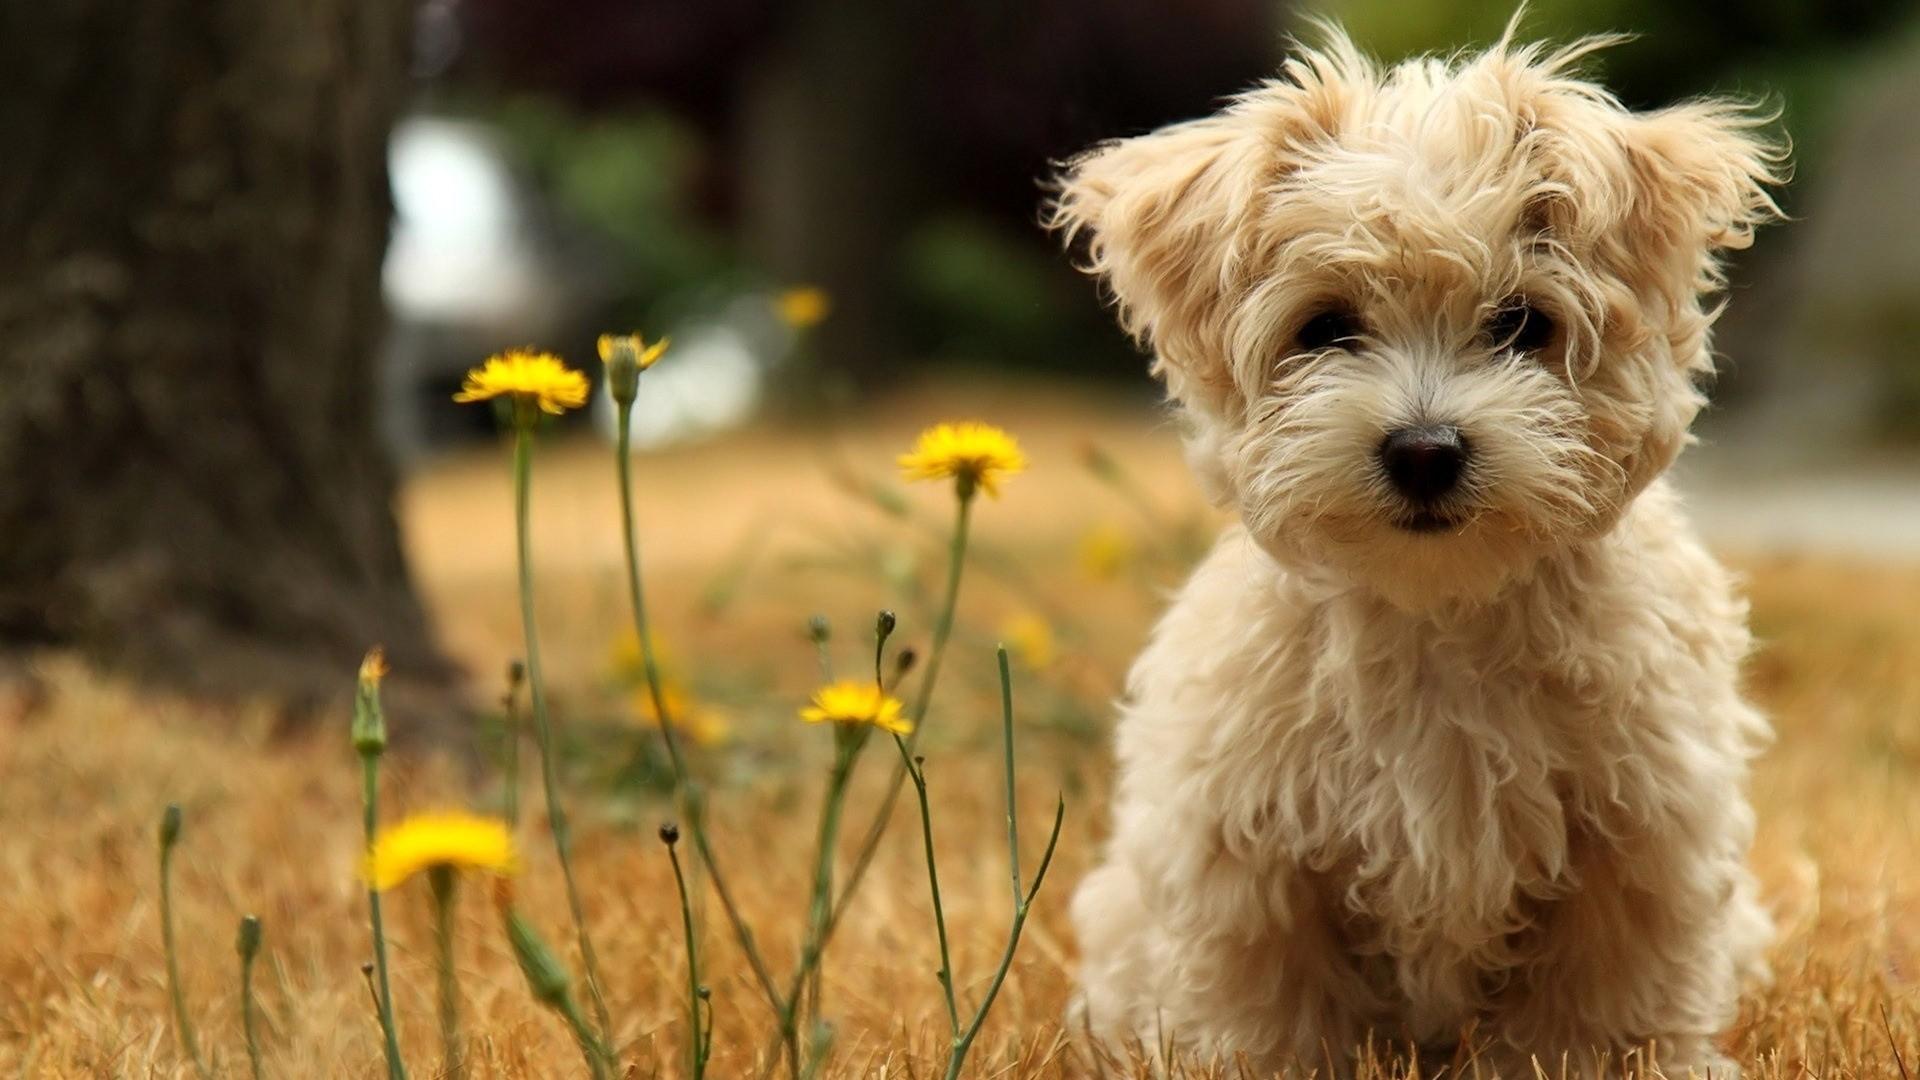 desktop wallpaper puppies - 2018 cute screensavers